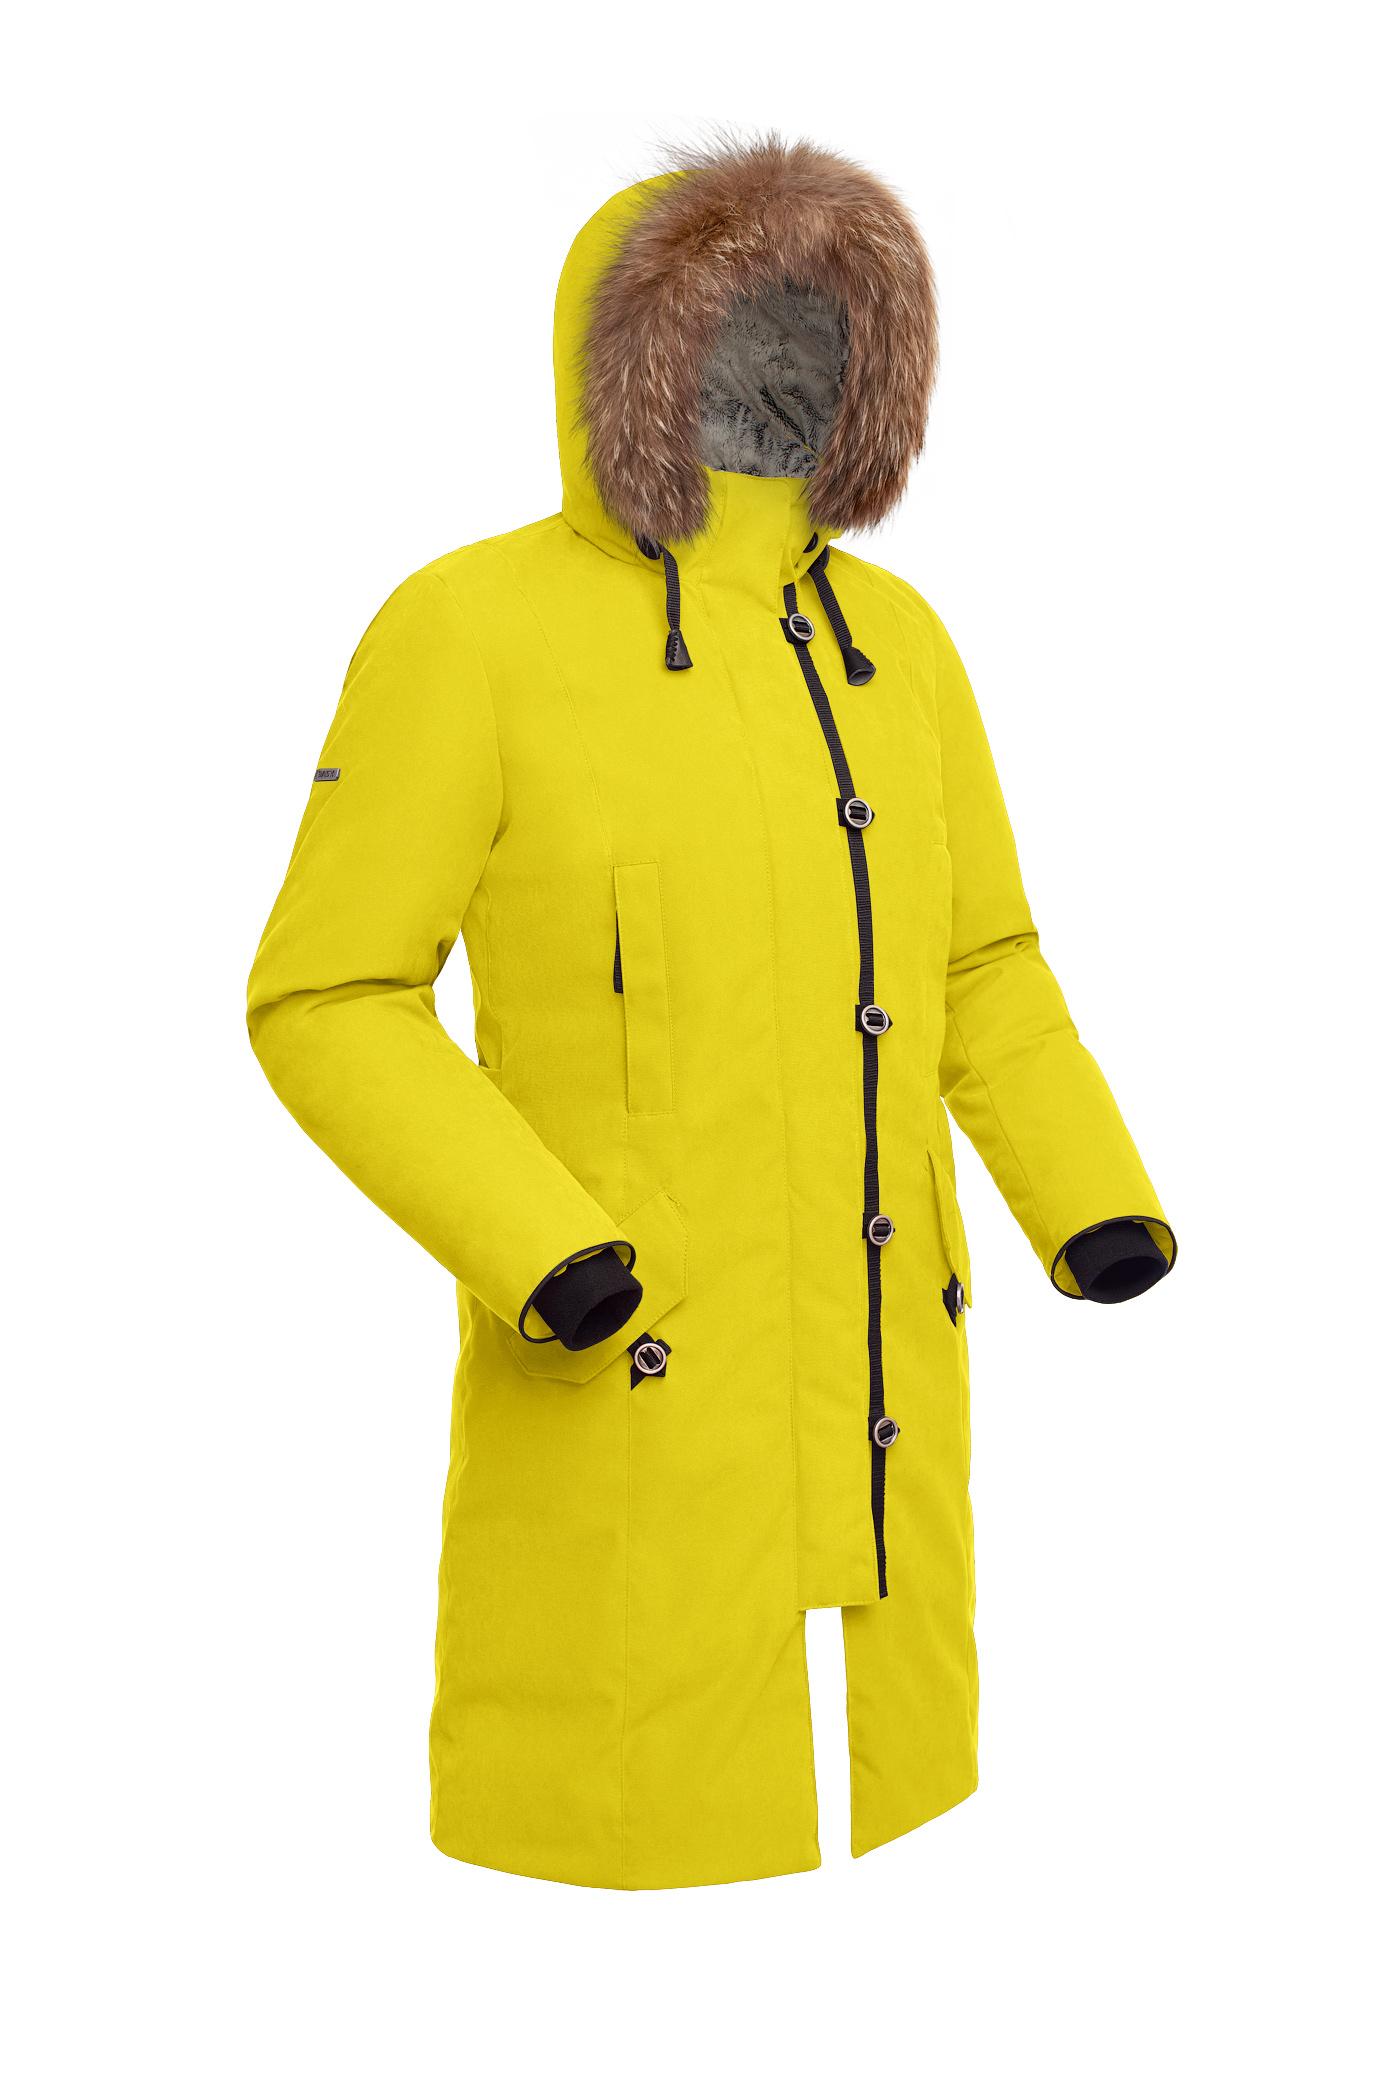 Пальто пуховое женское BASK HATANGA V2 желтое, Пальто - арт. 999820409